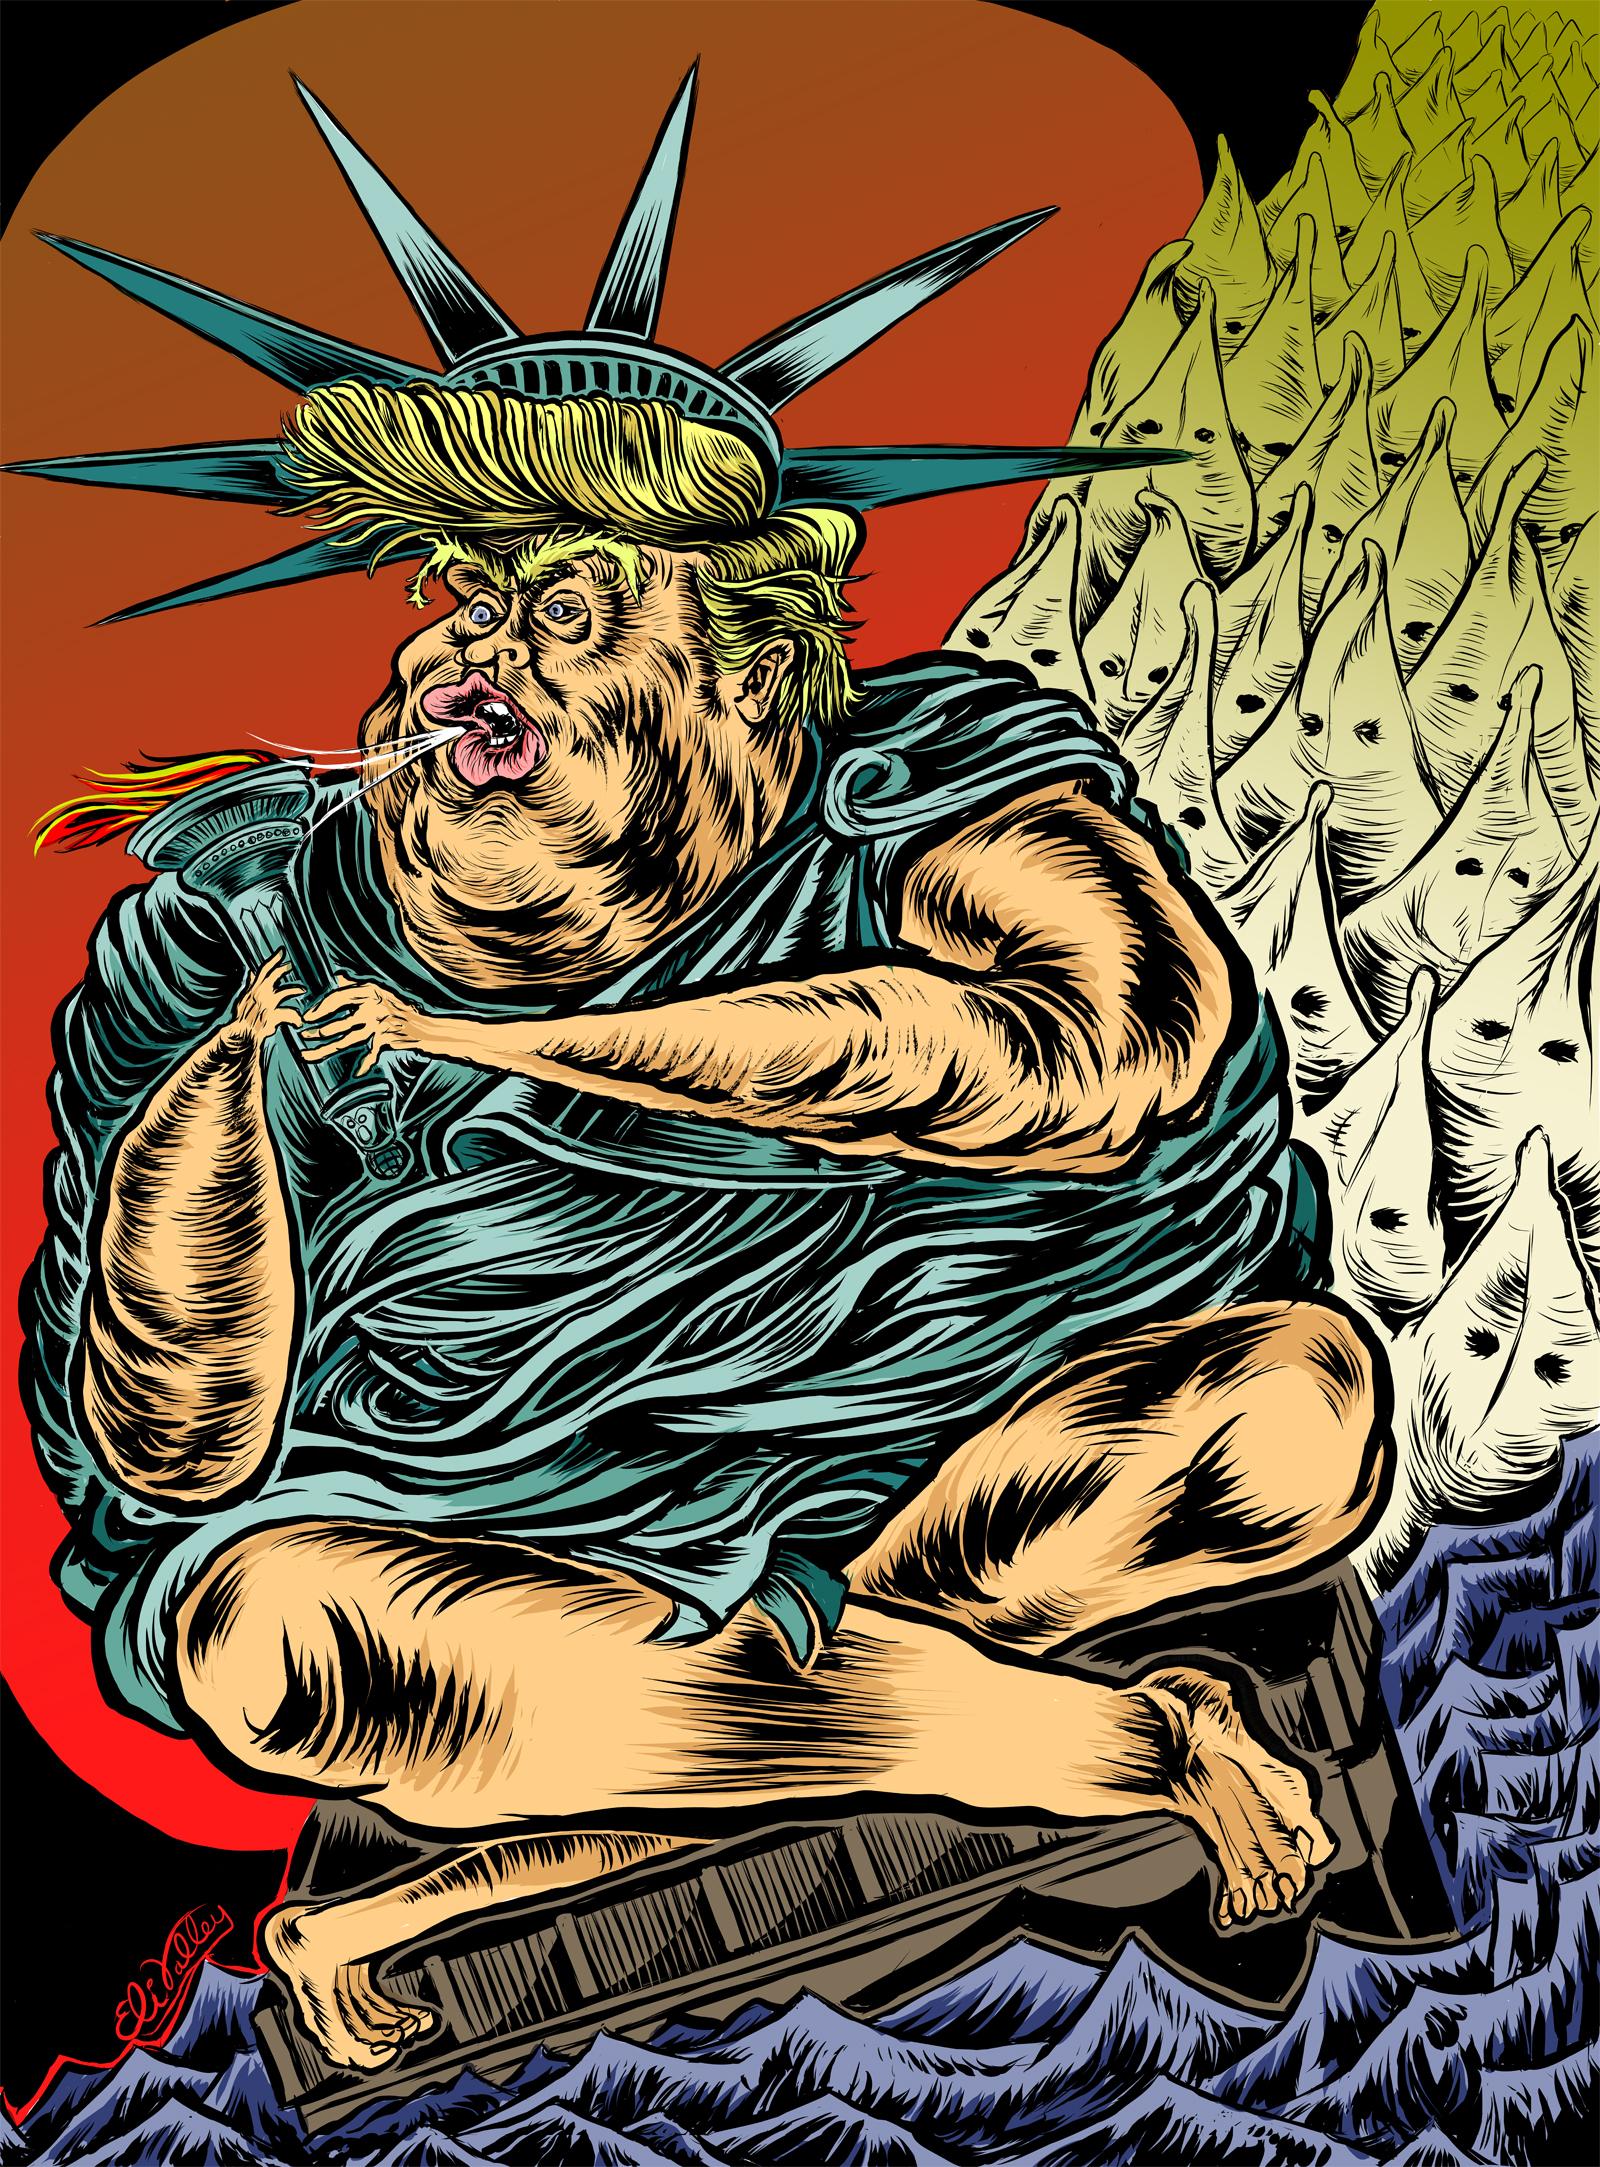 Trump Lady Liberty, 11/30/16